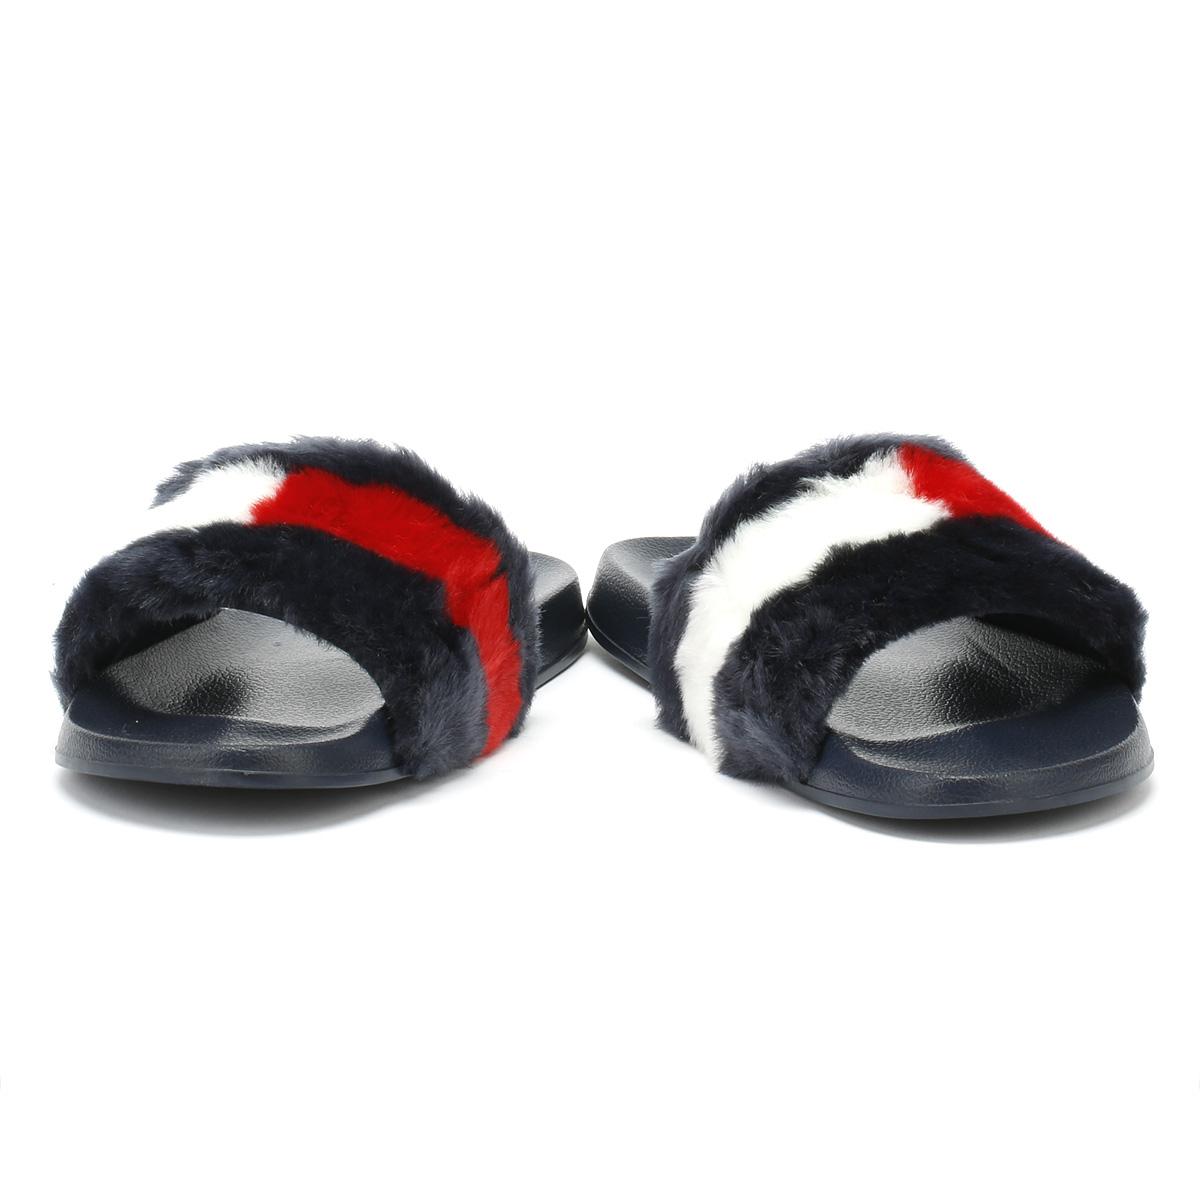 Tommy Hilfiger Damenschuhe Midnight Navy Funny Summer Fur Pool Slides Summer Funny Beach Sandales 7b10b1